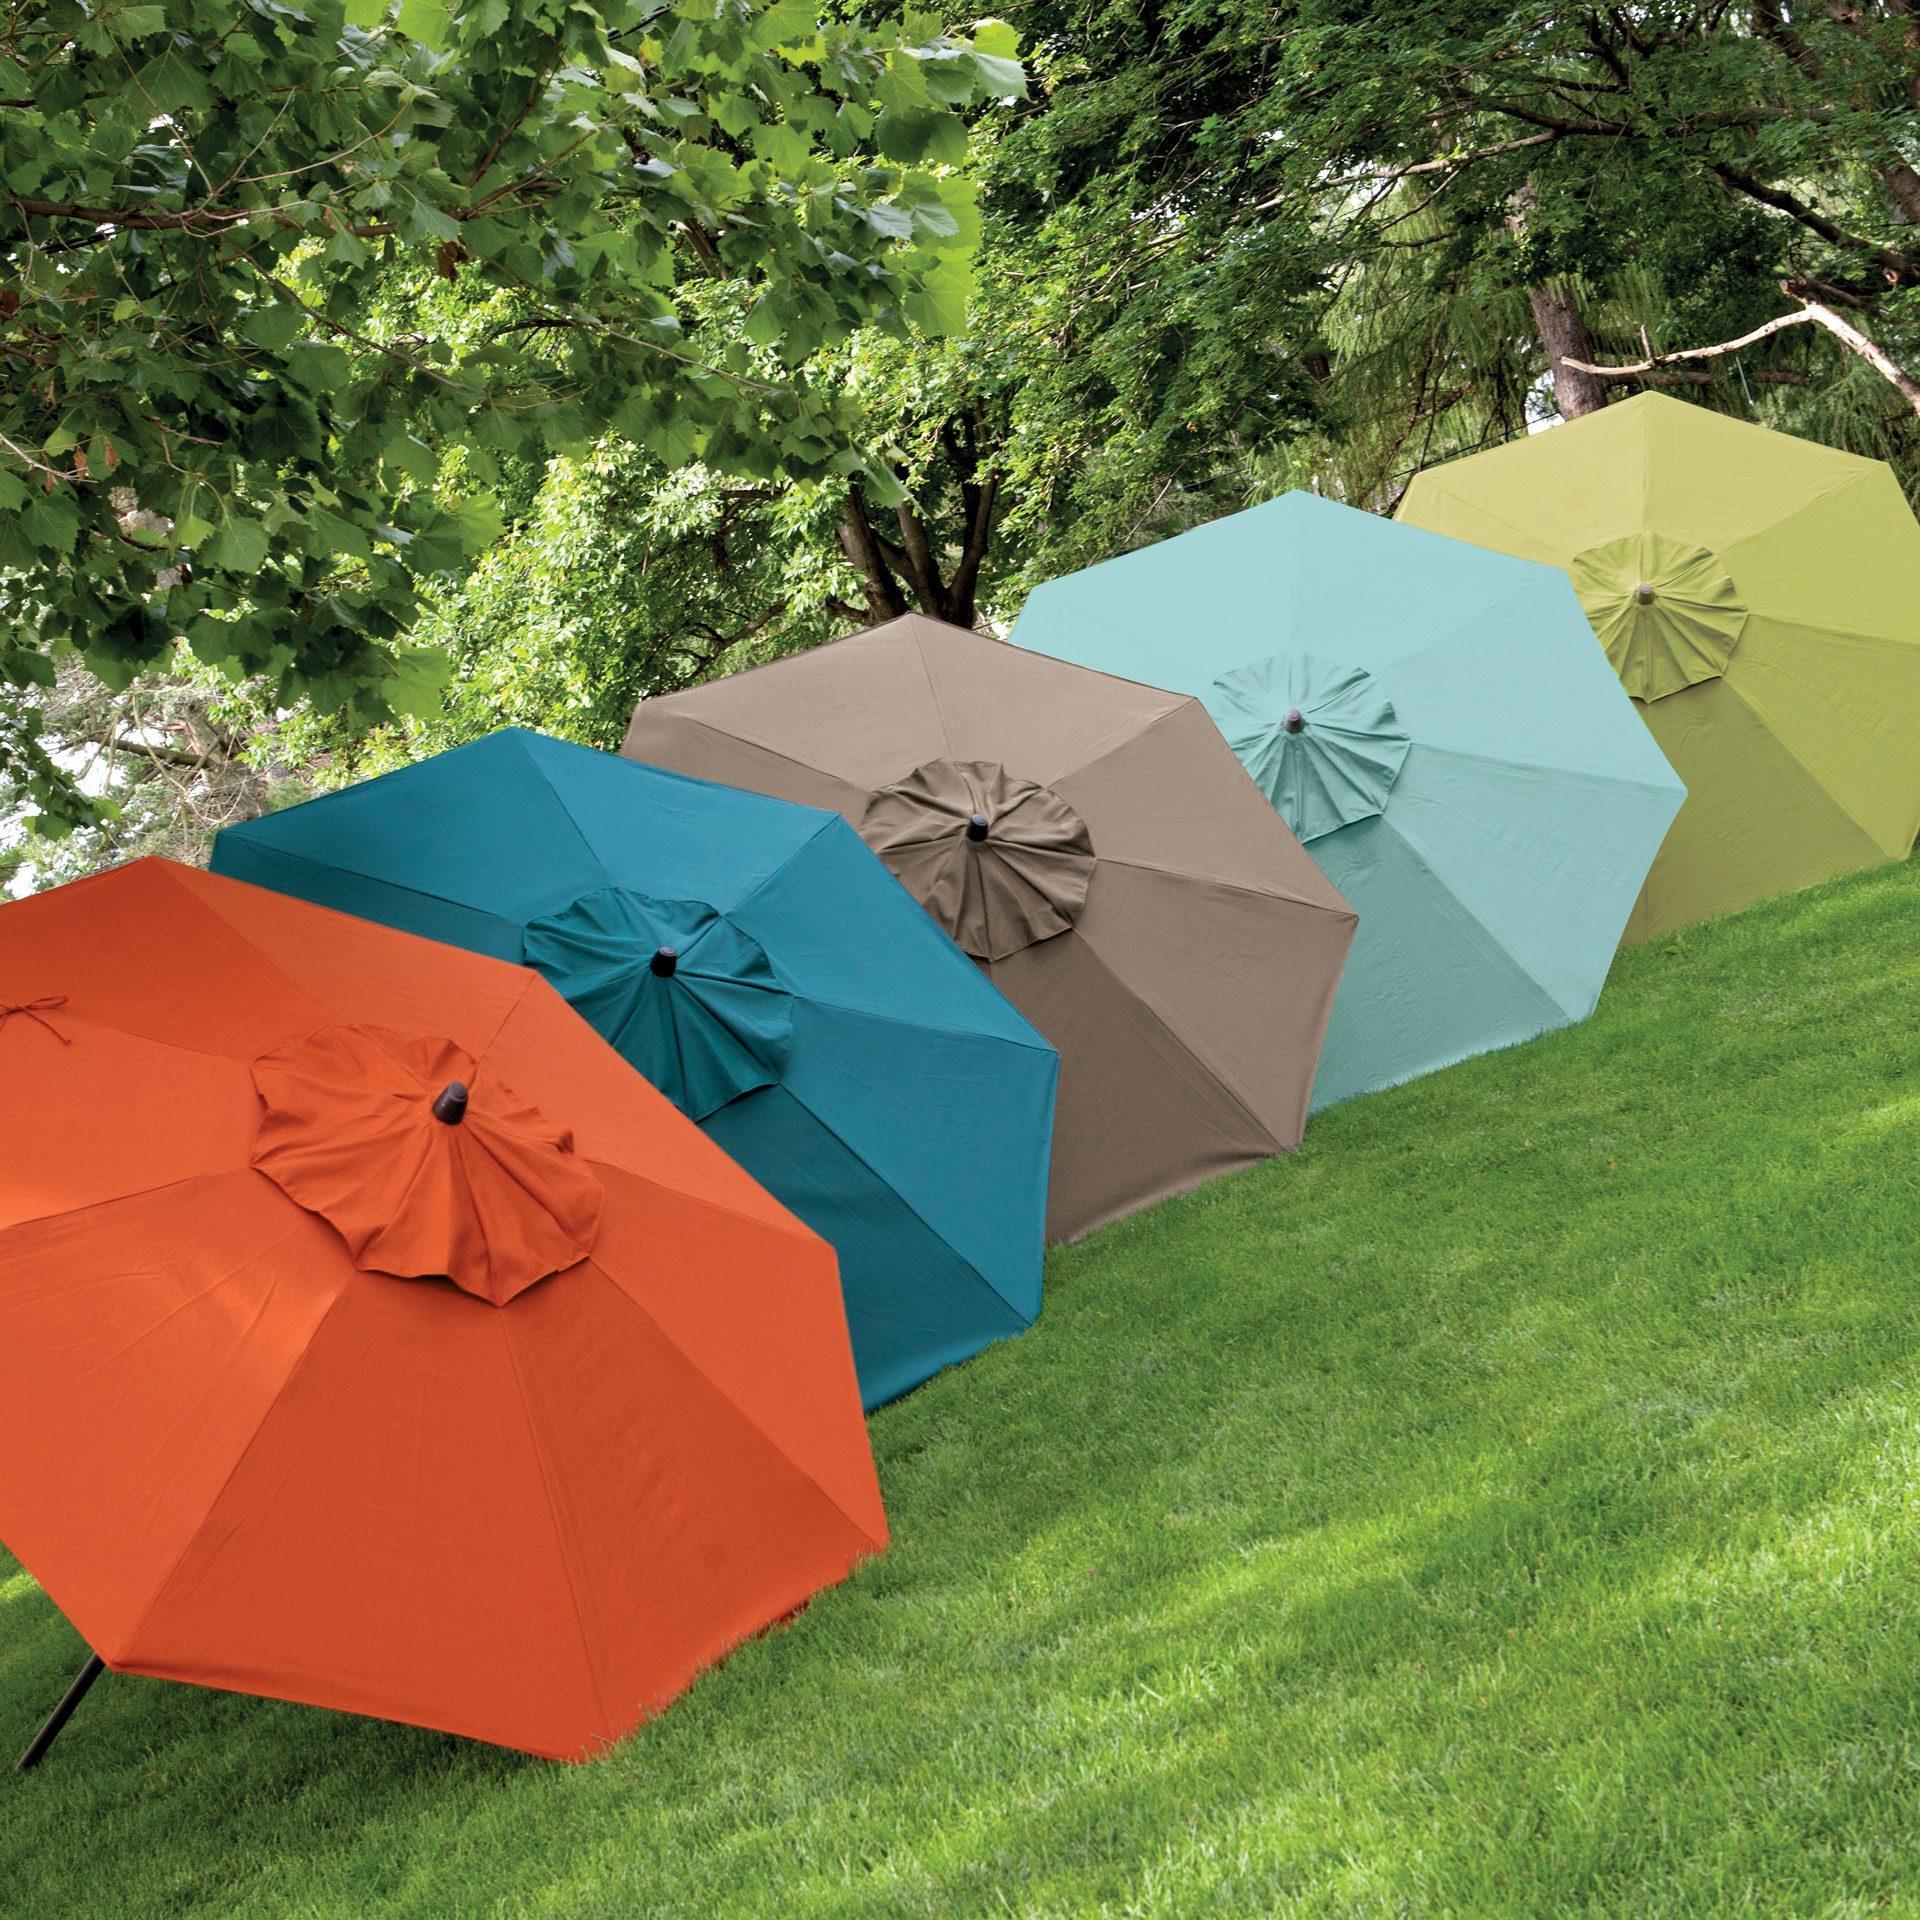 treasure garden umbrellas OFUEHLG